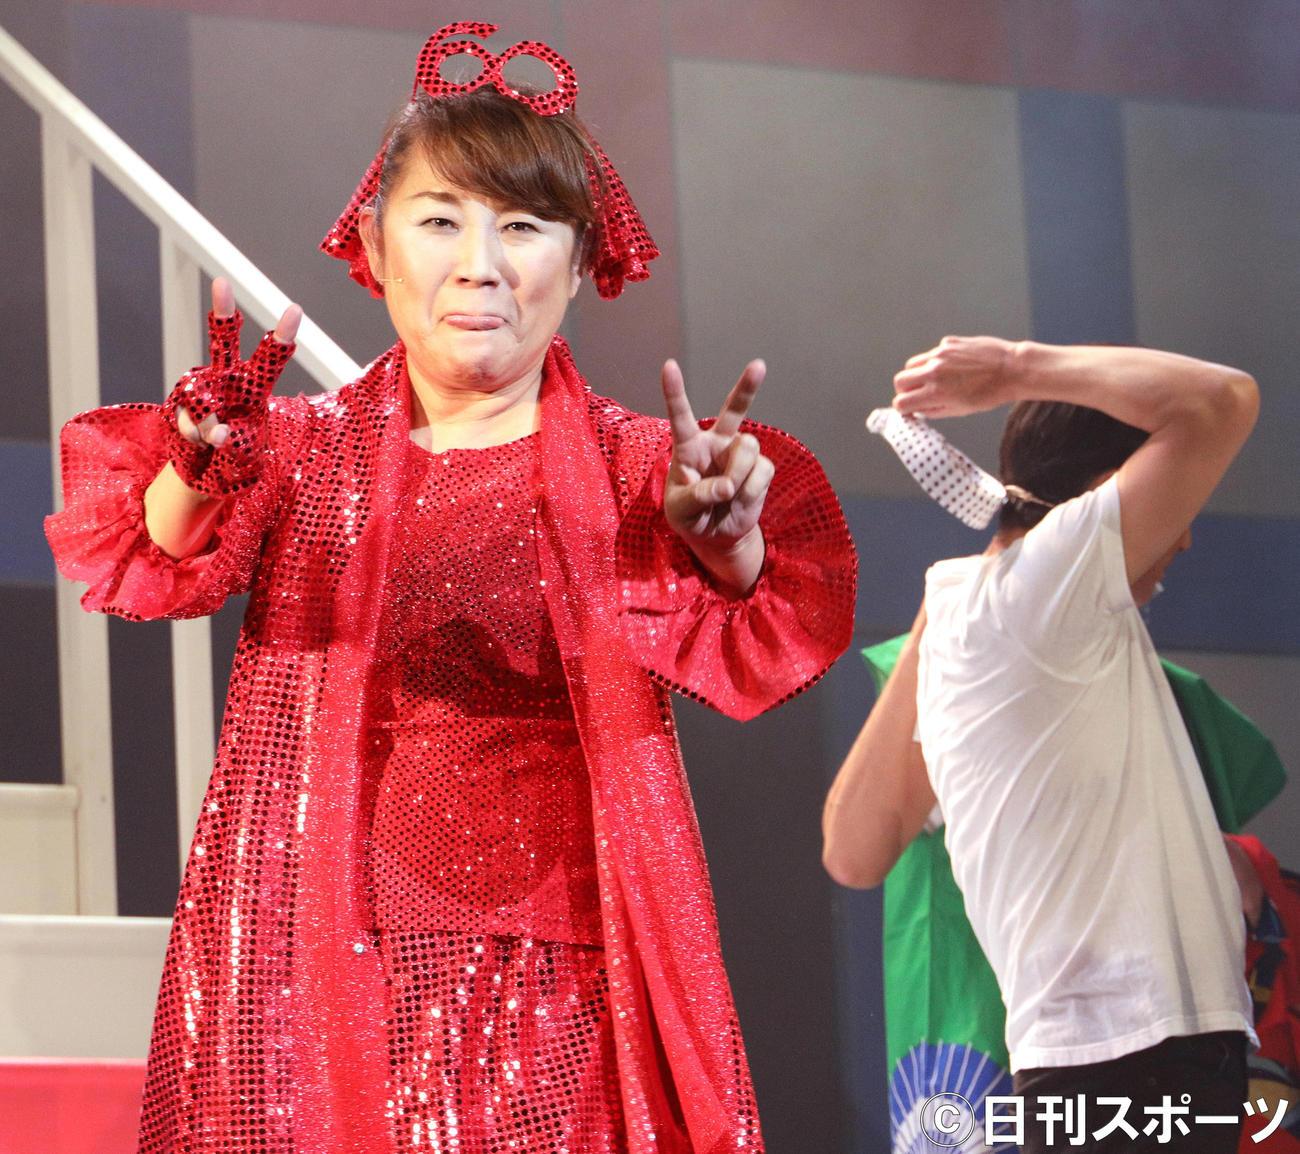 「山田邦子の門2020」還暦記念舞台公演を行う山田邦子(撮影・中島郁夫)